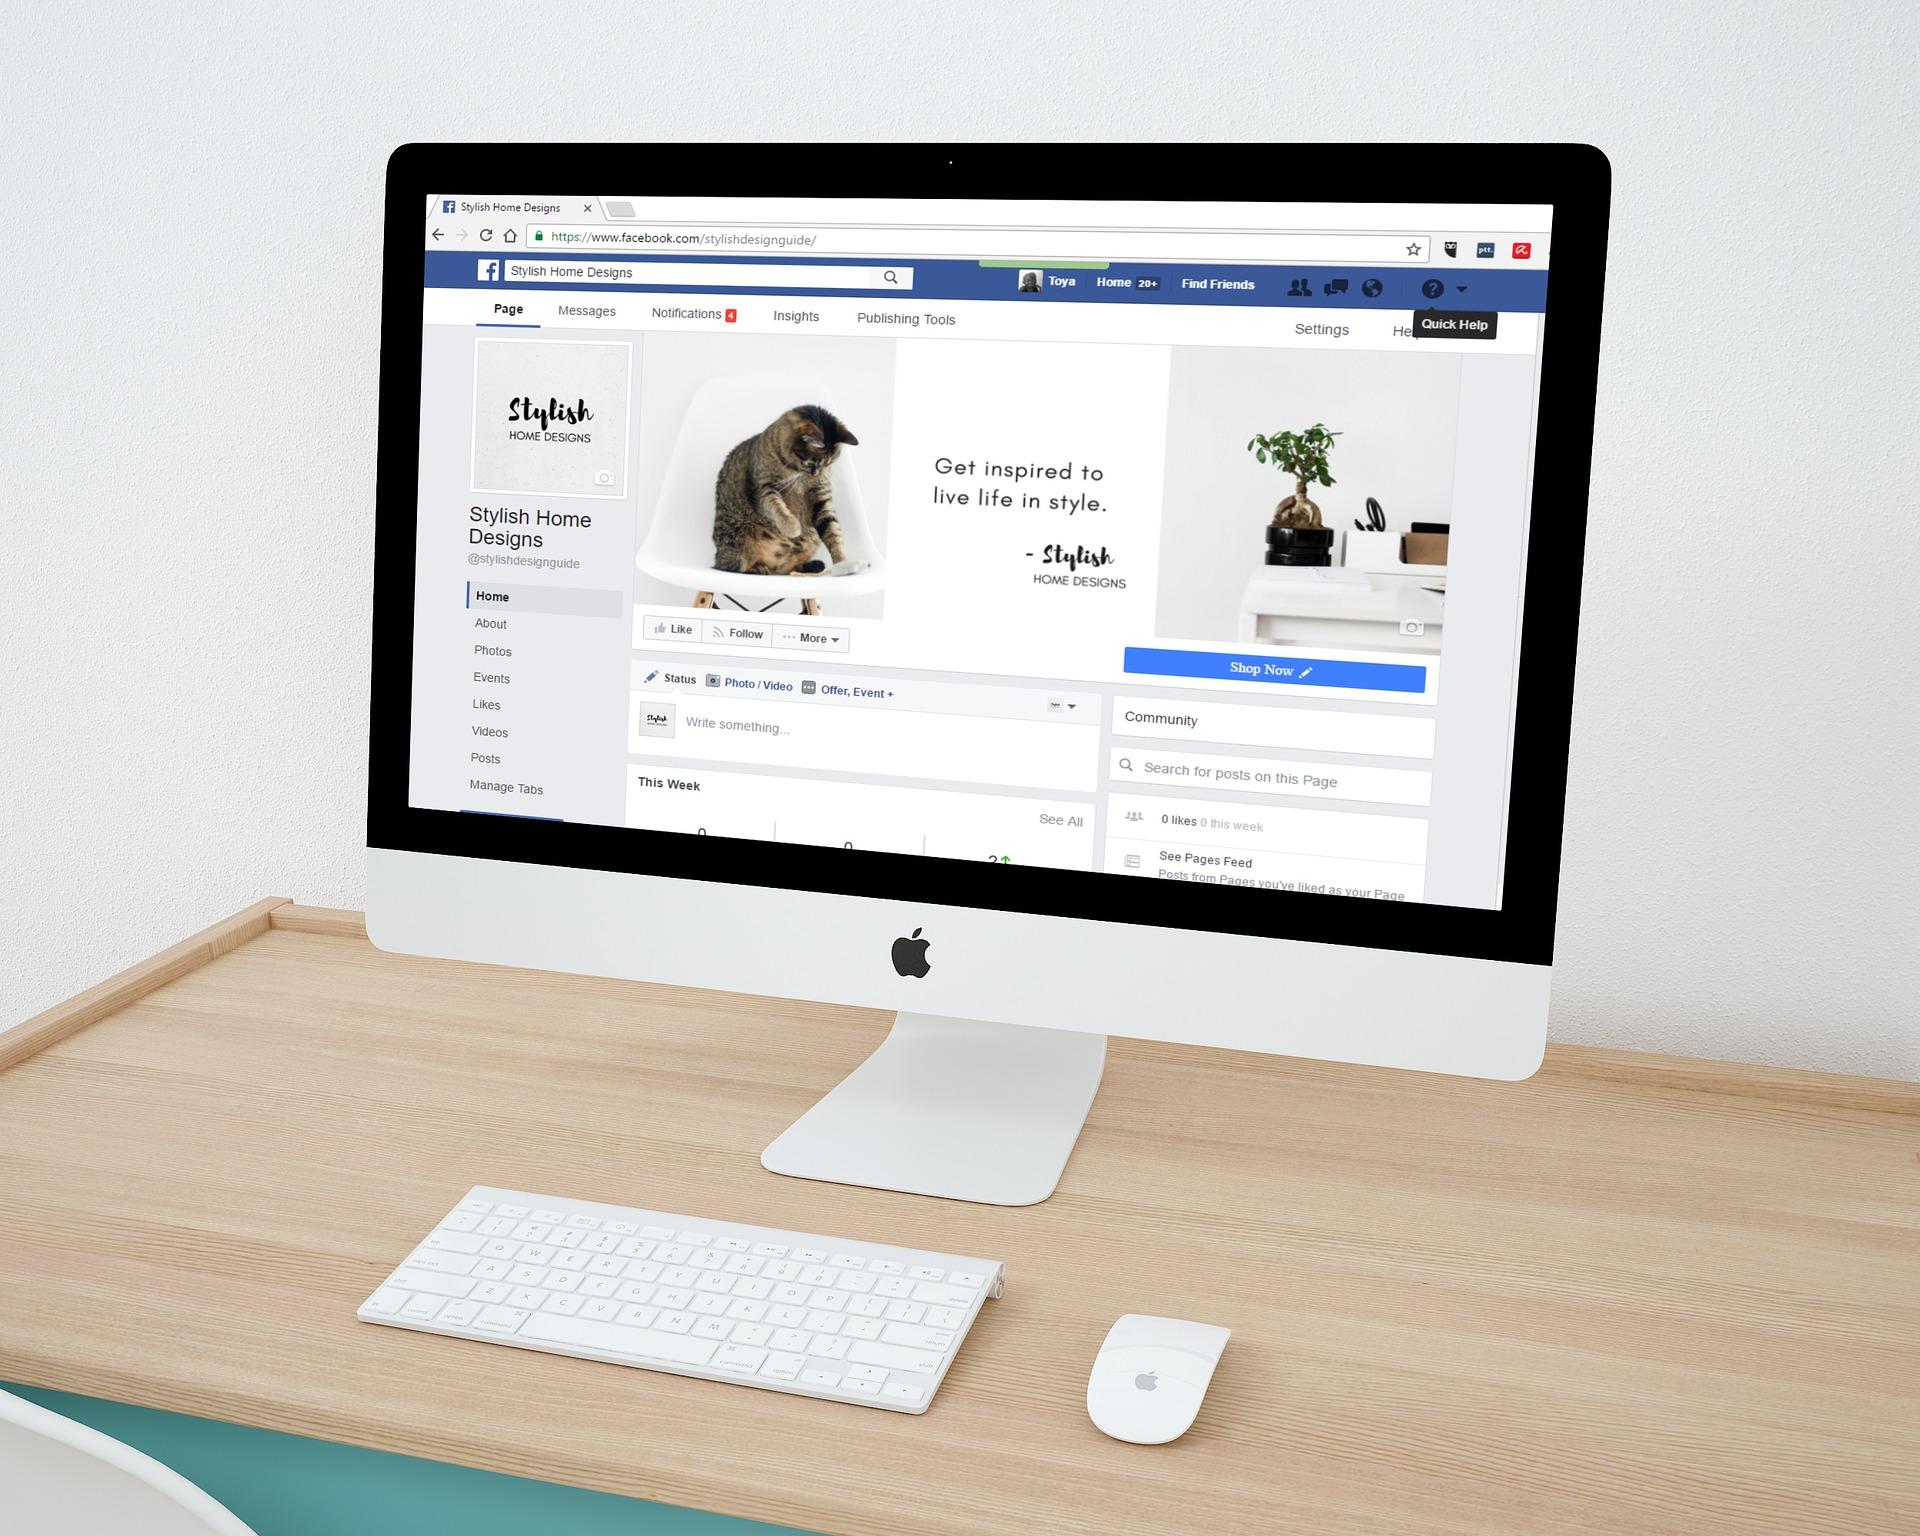 facebook on computer screen